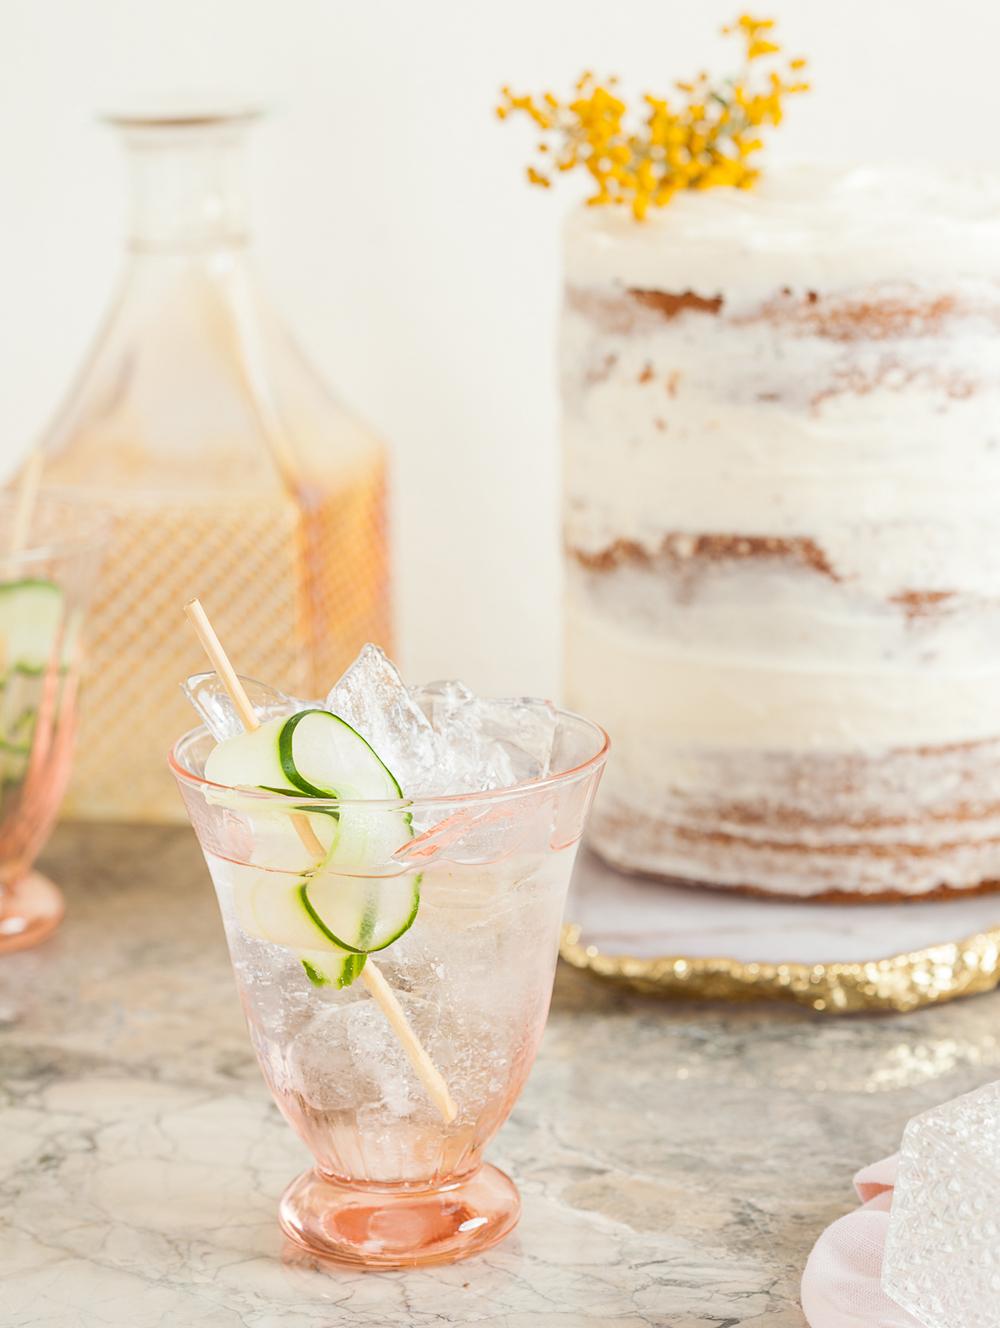 Rachel Grunig Table Top Photo Stylist